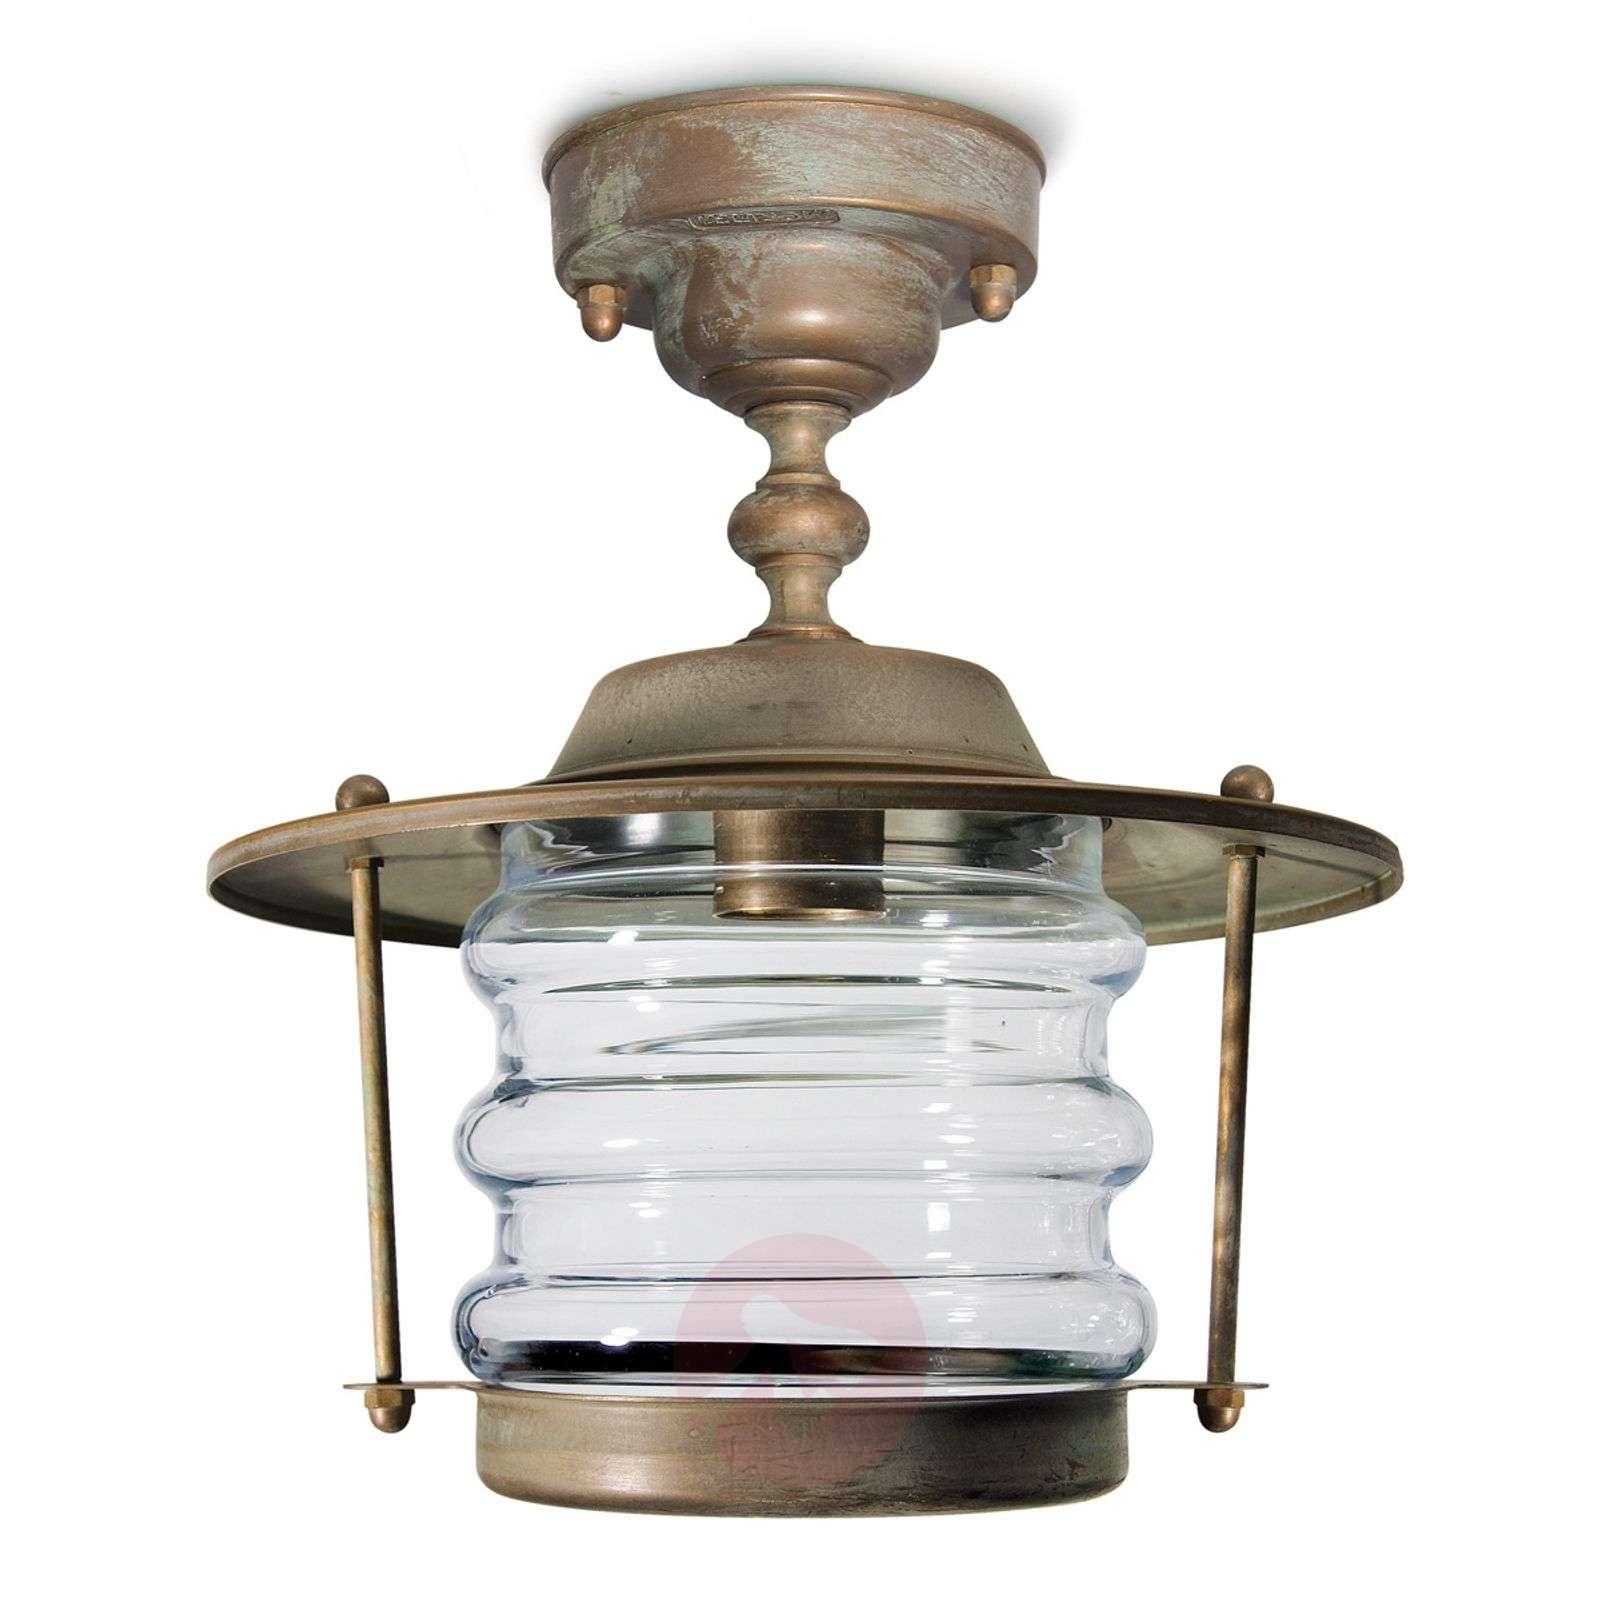 Outdoor ceiling light Adessora seawater-res.-6515256-01